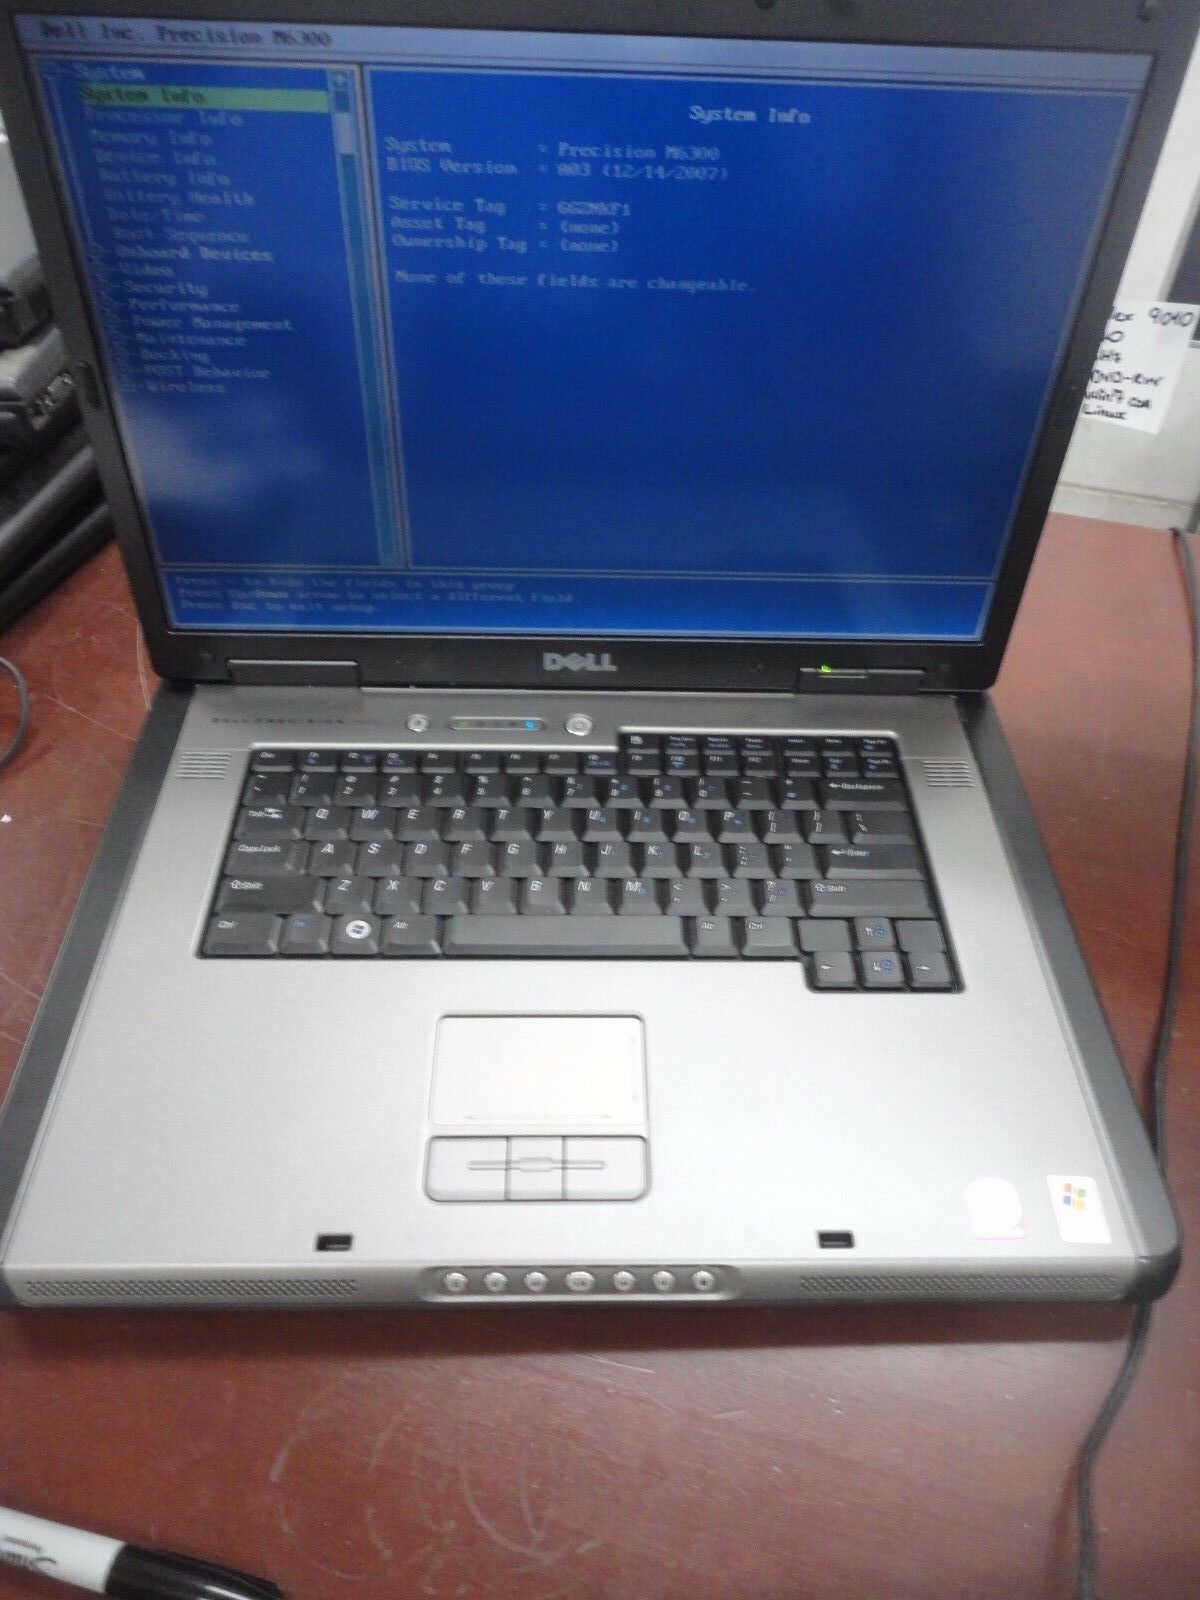 "DELL Precision M6300 17"" Core2Duo 2GHz 4GB 160GB DVD/RW Wi-Fi LINUX Laptop  + AC"